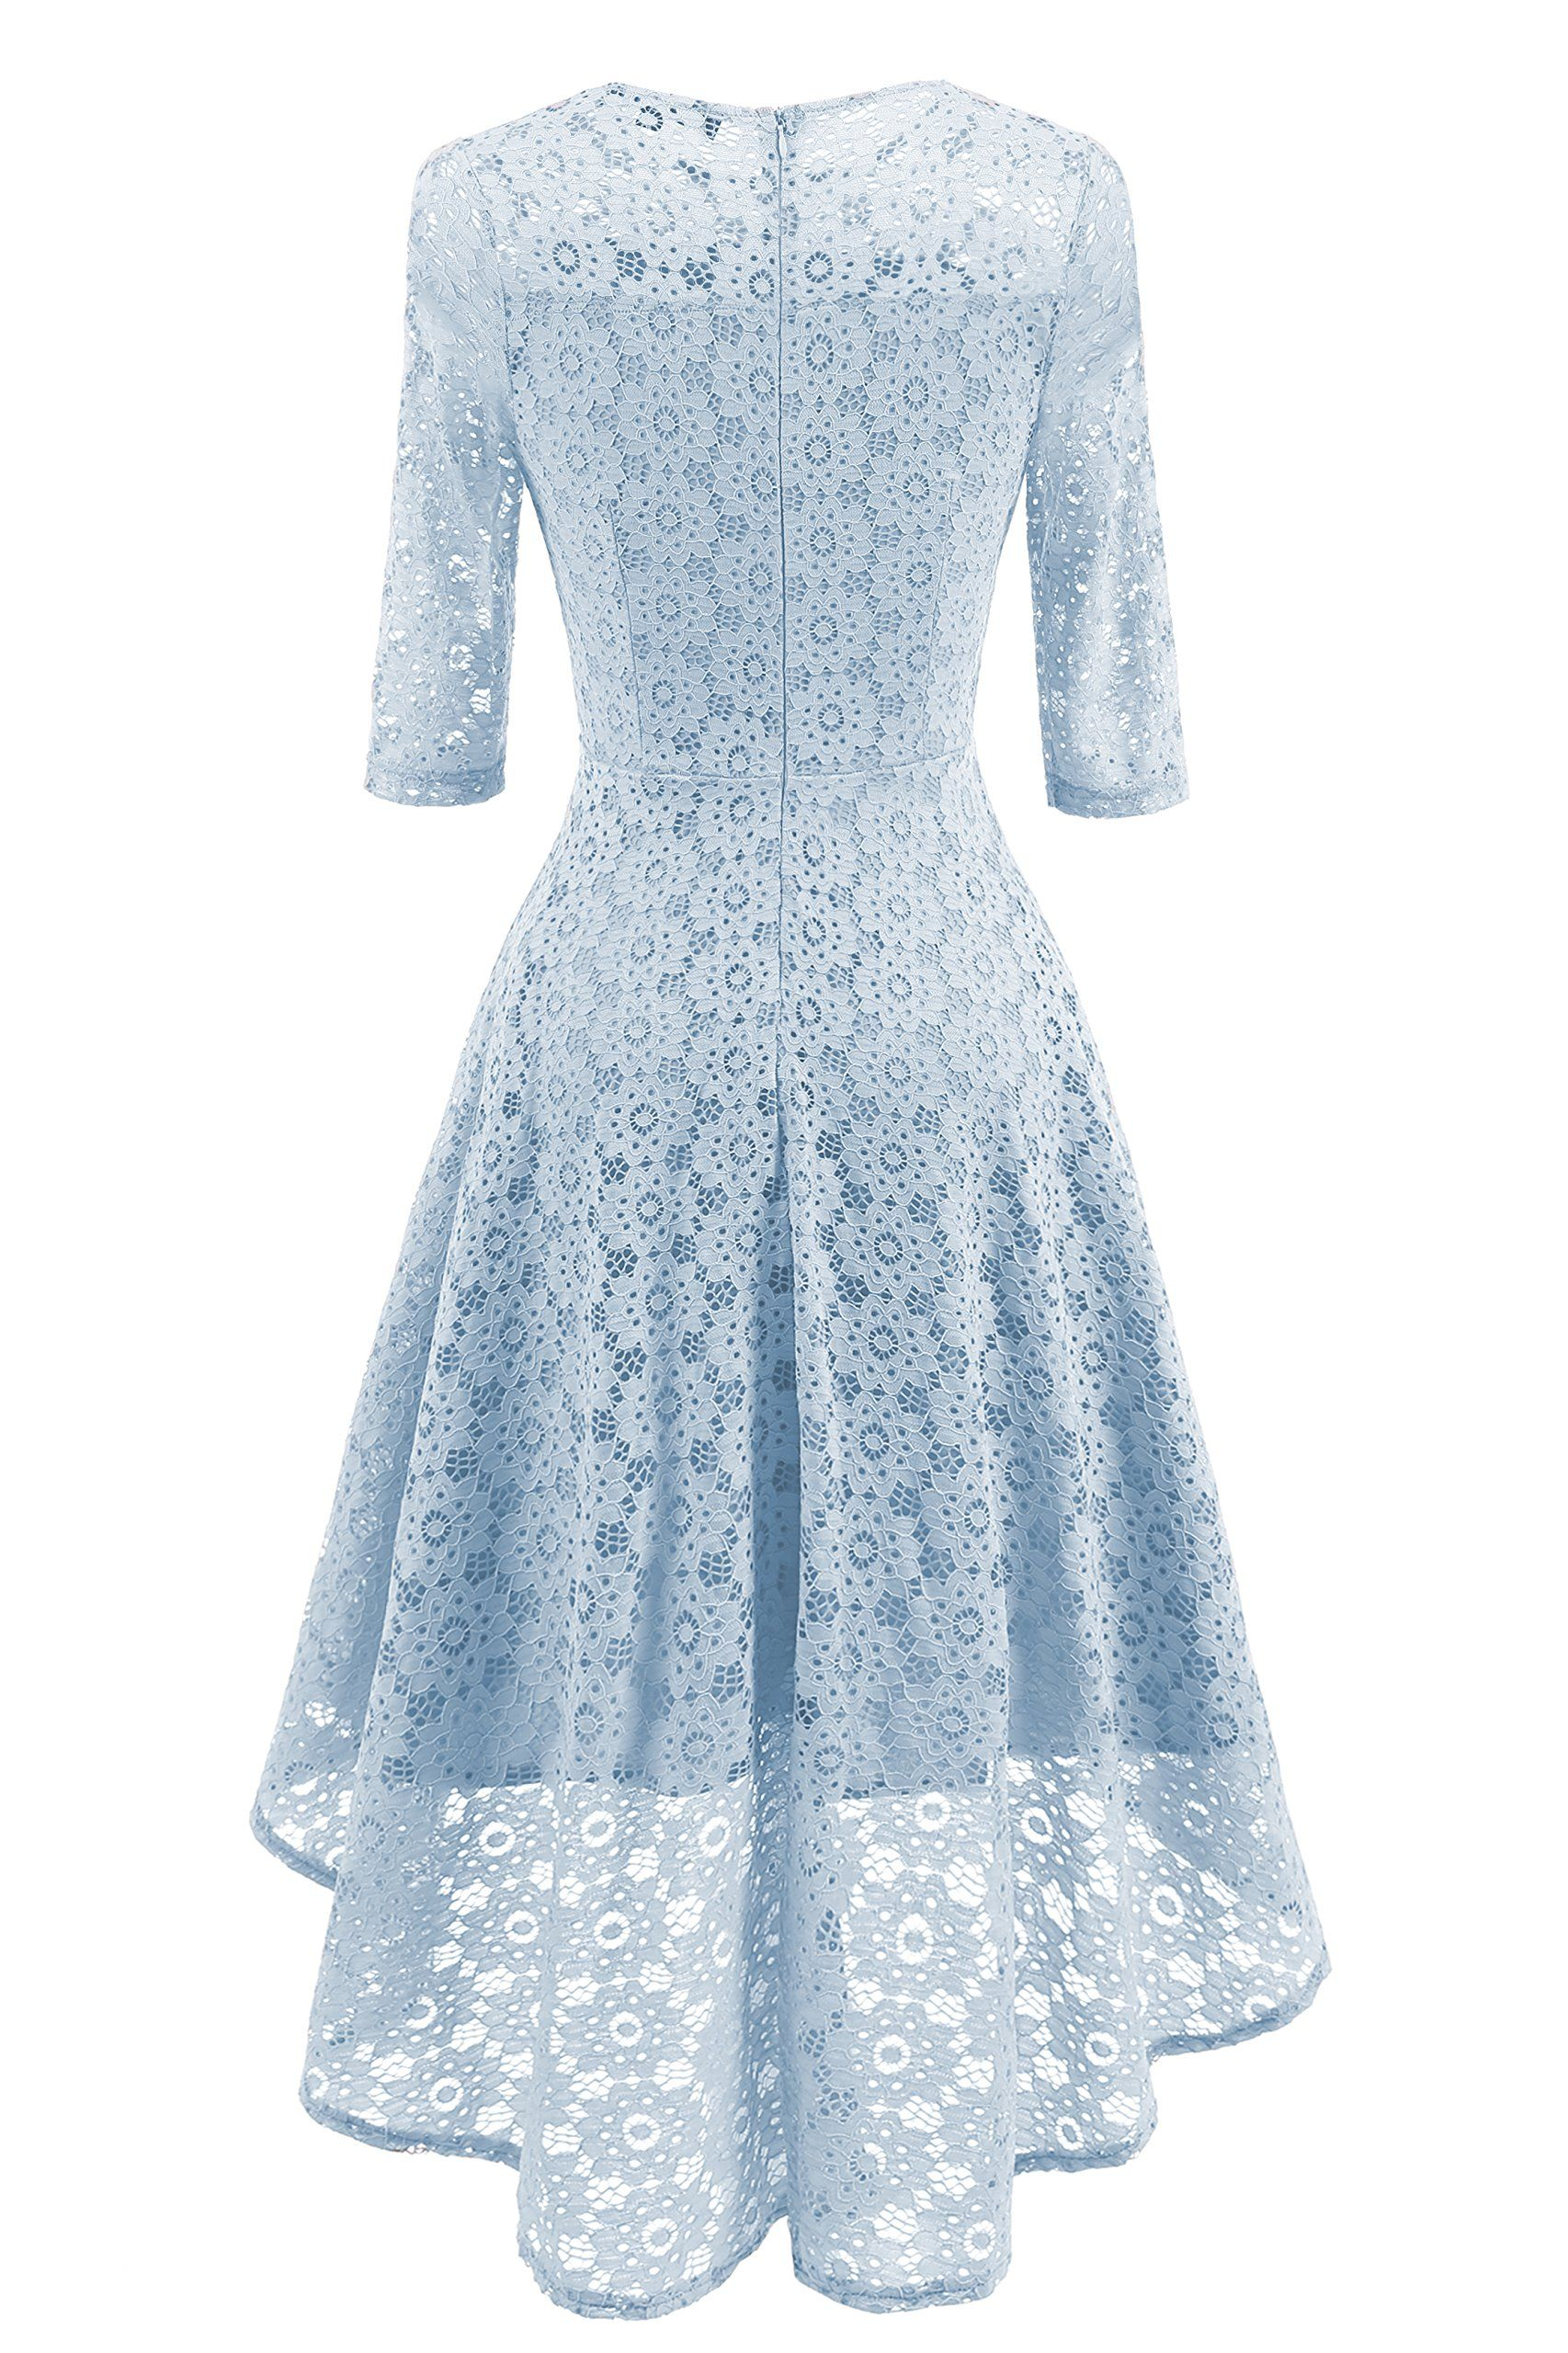 Jh dress womens lace formal vintage sleeve elegant short prom